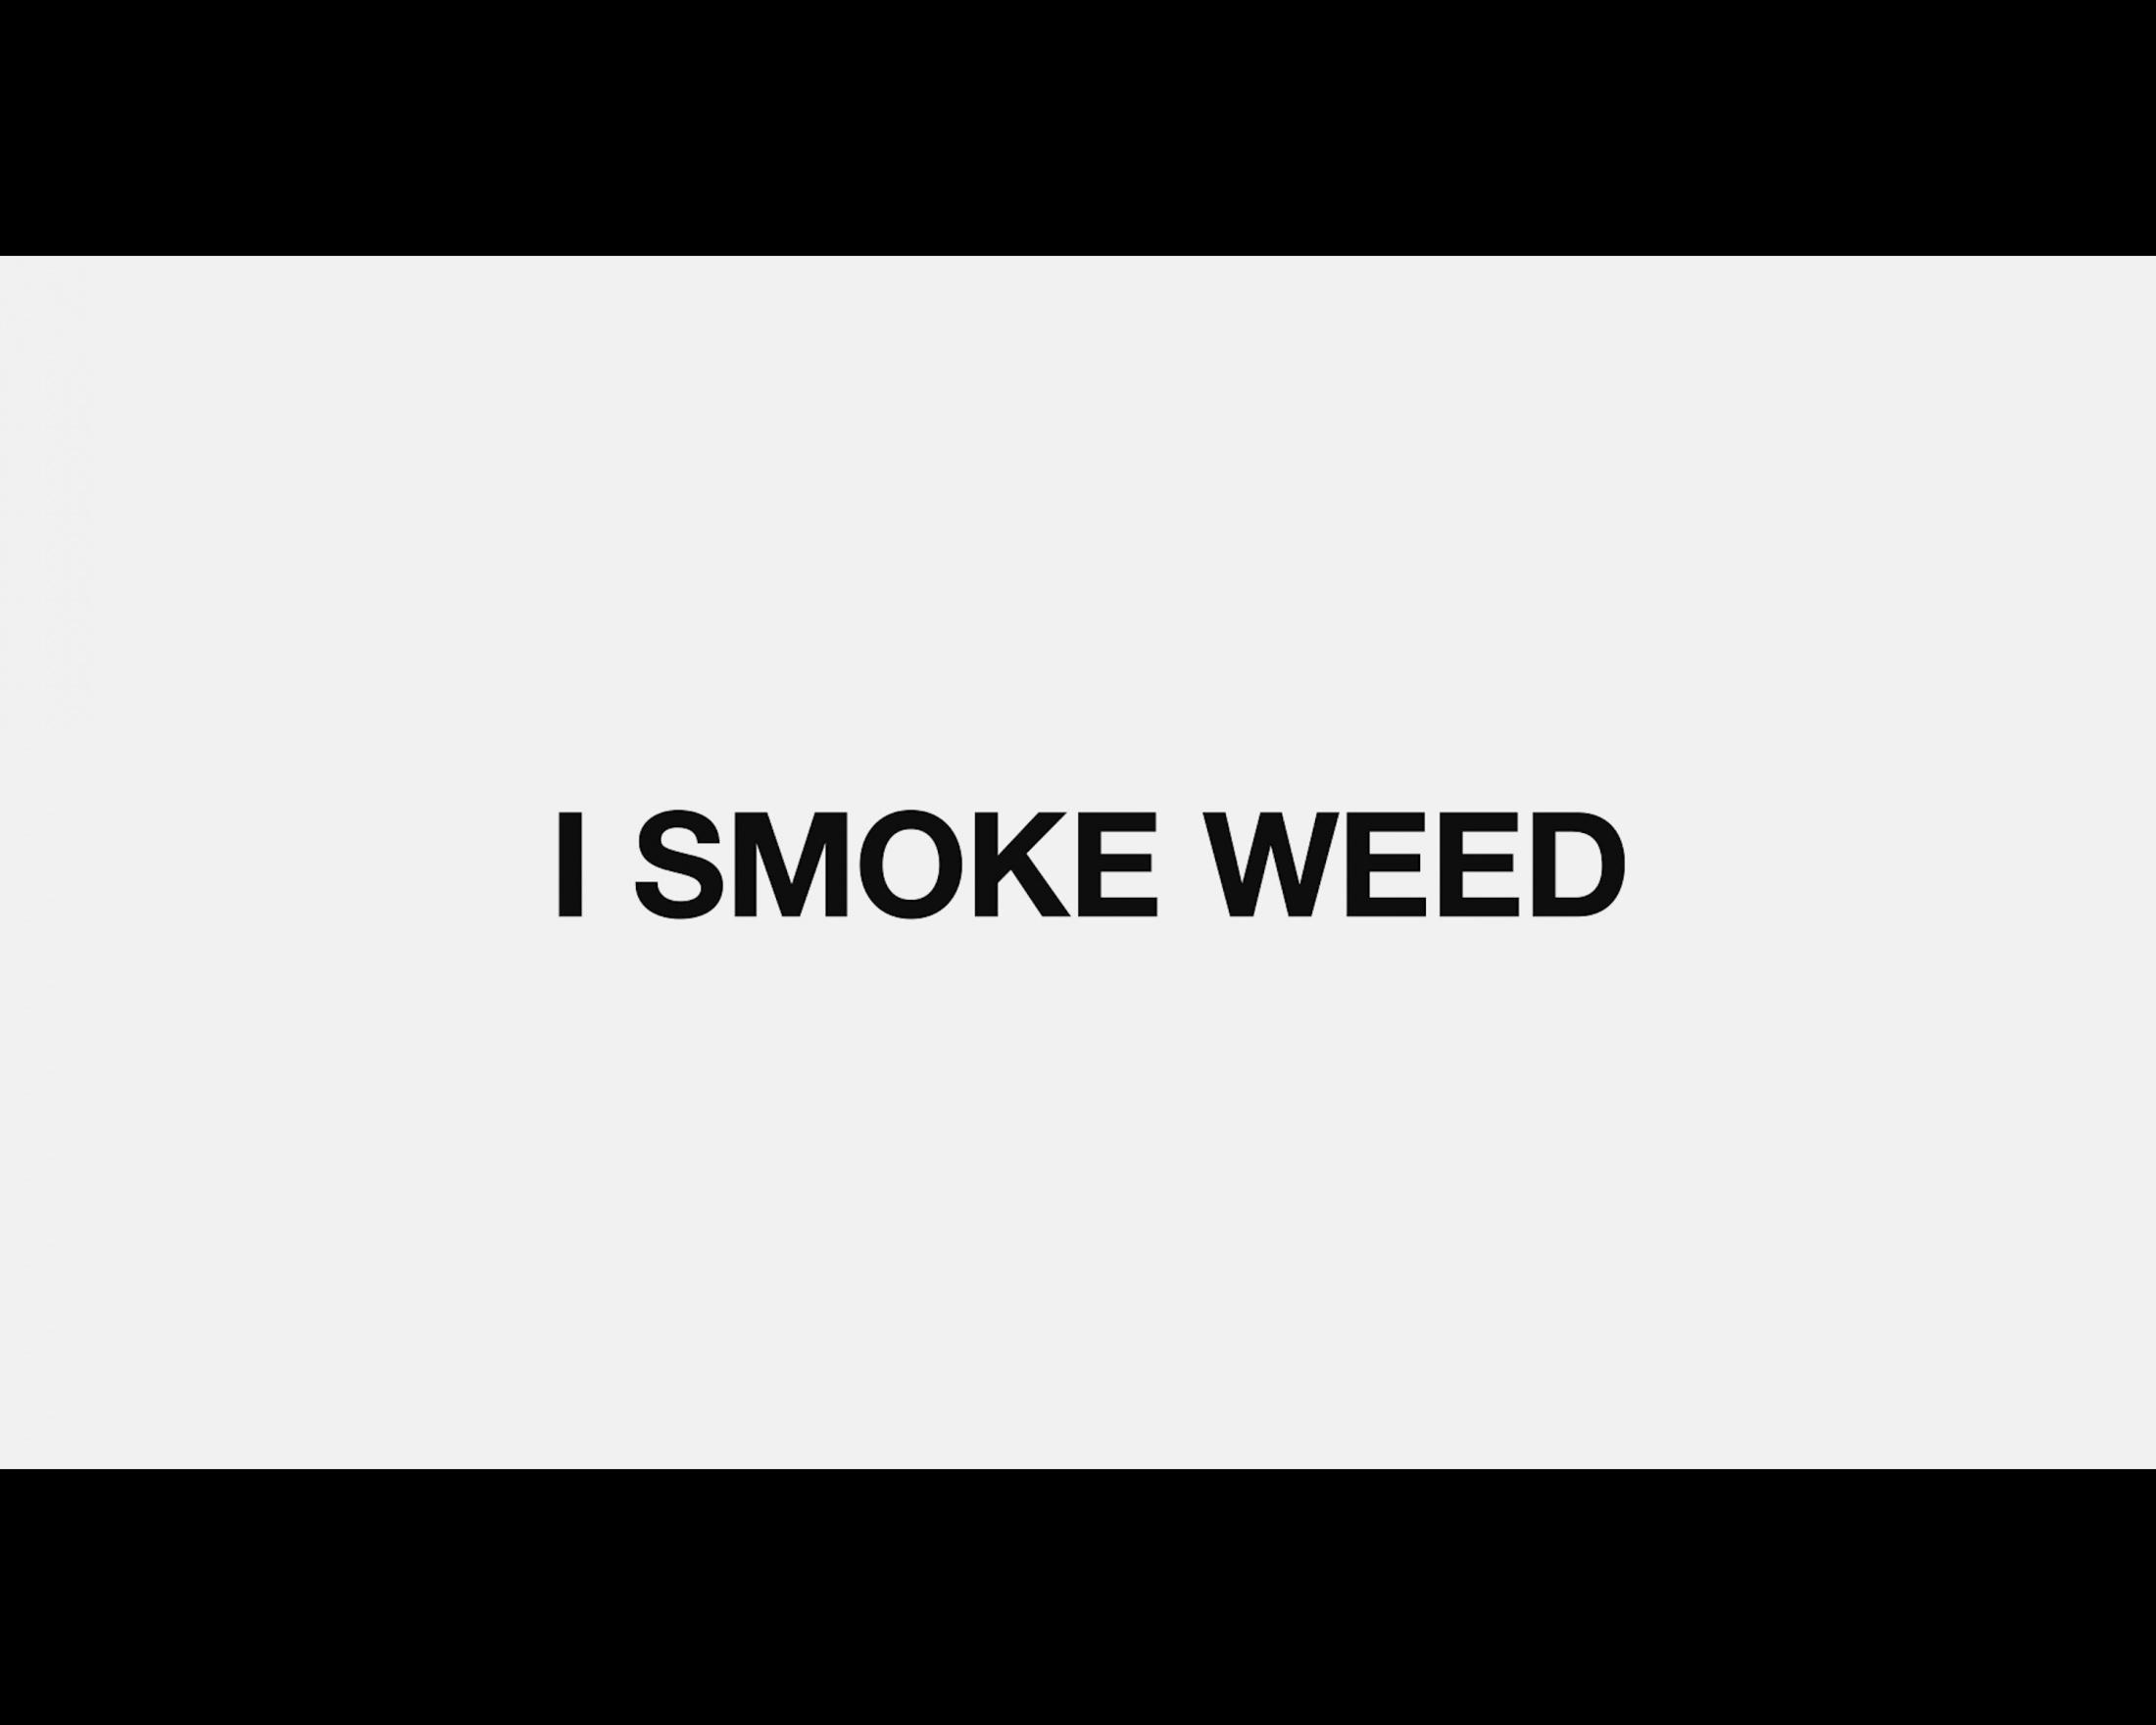 Thumbnail for I Smoke Weed